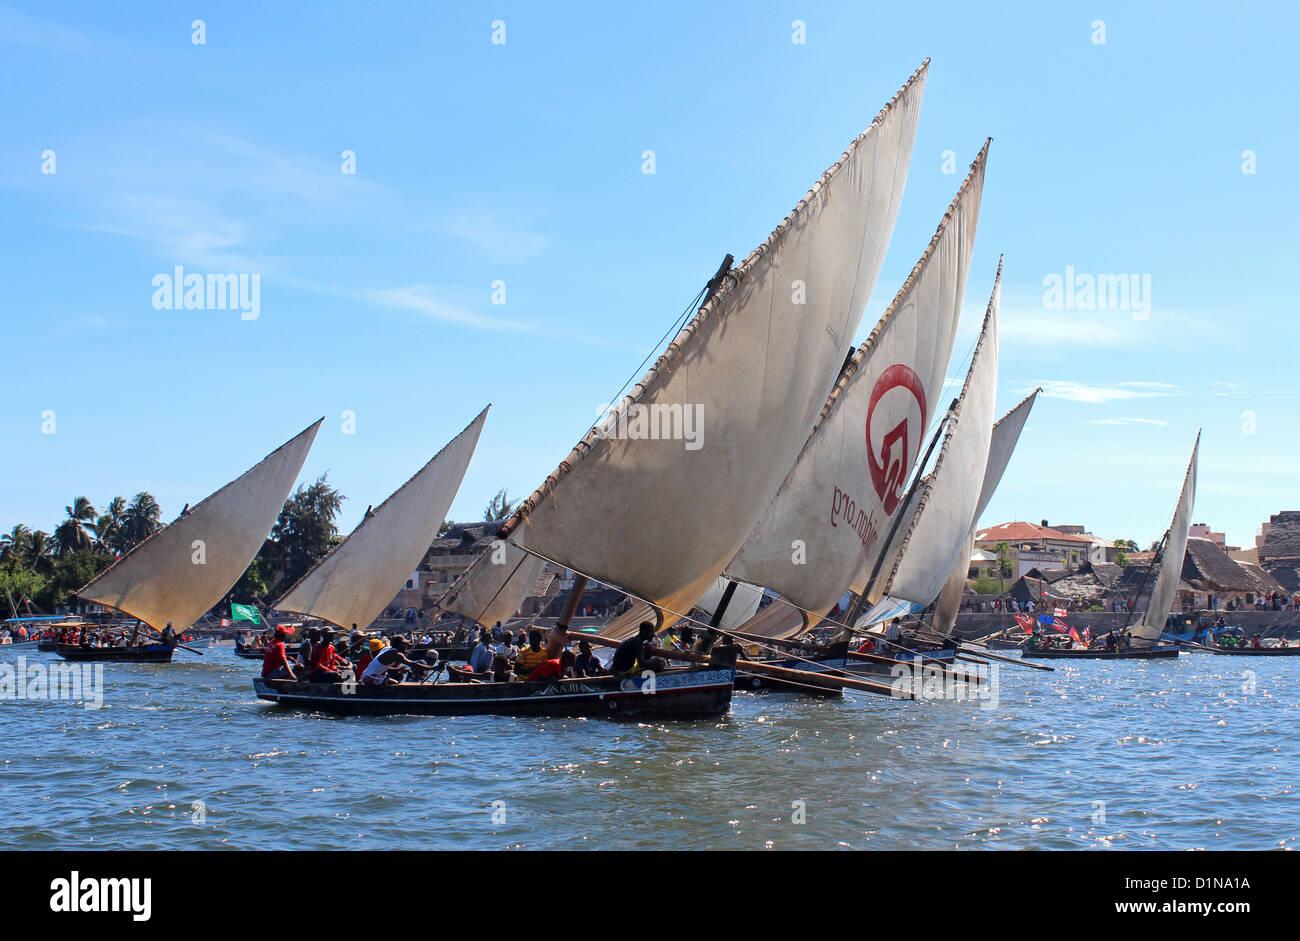 Dhow boat race at the Lamu Cultural Festival, Lamu Island, Kenya, East Africa - Stock Image